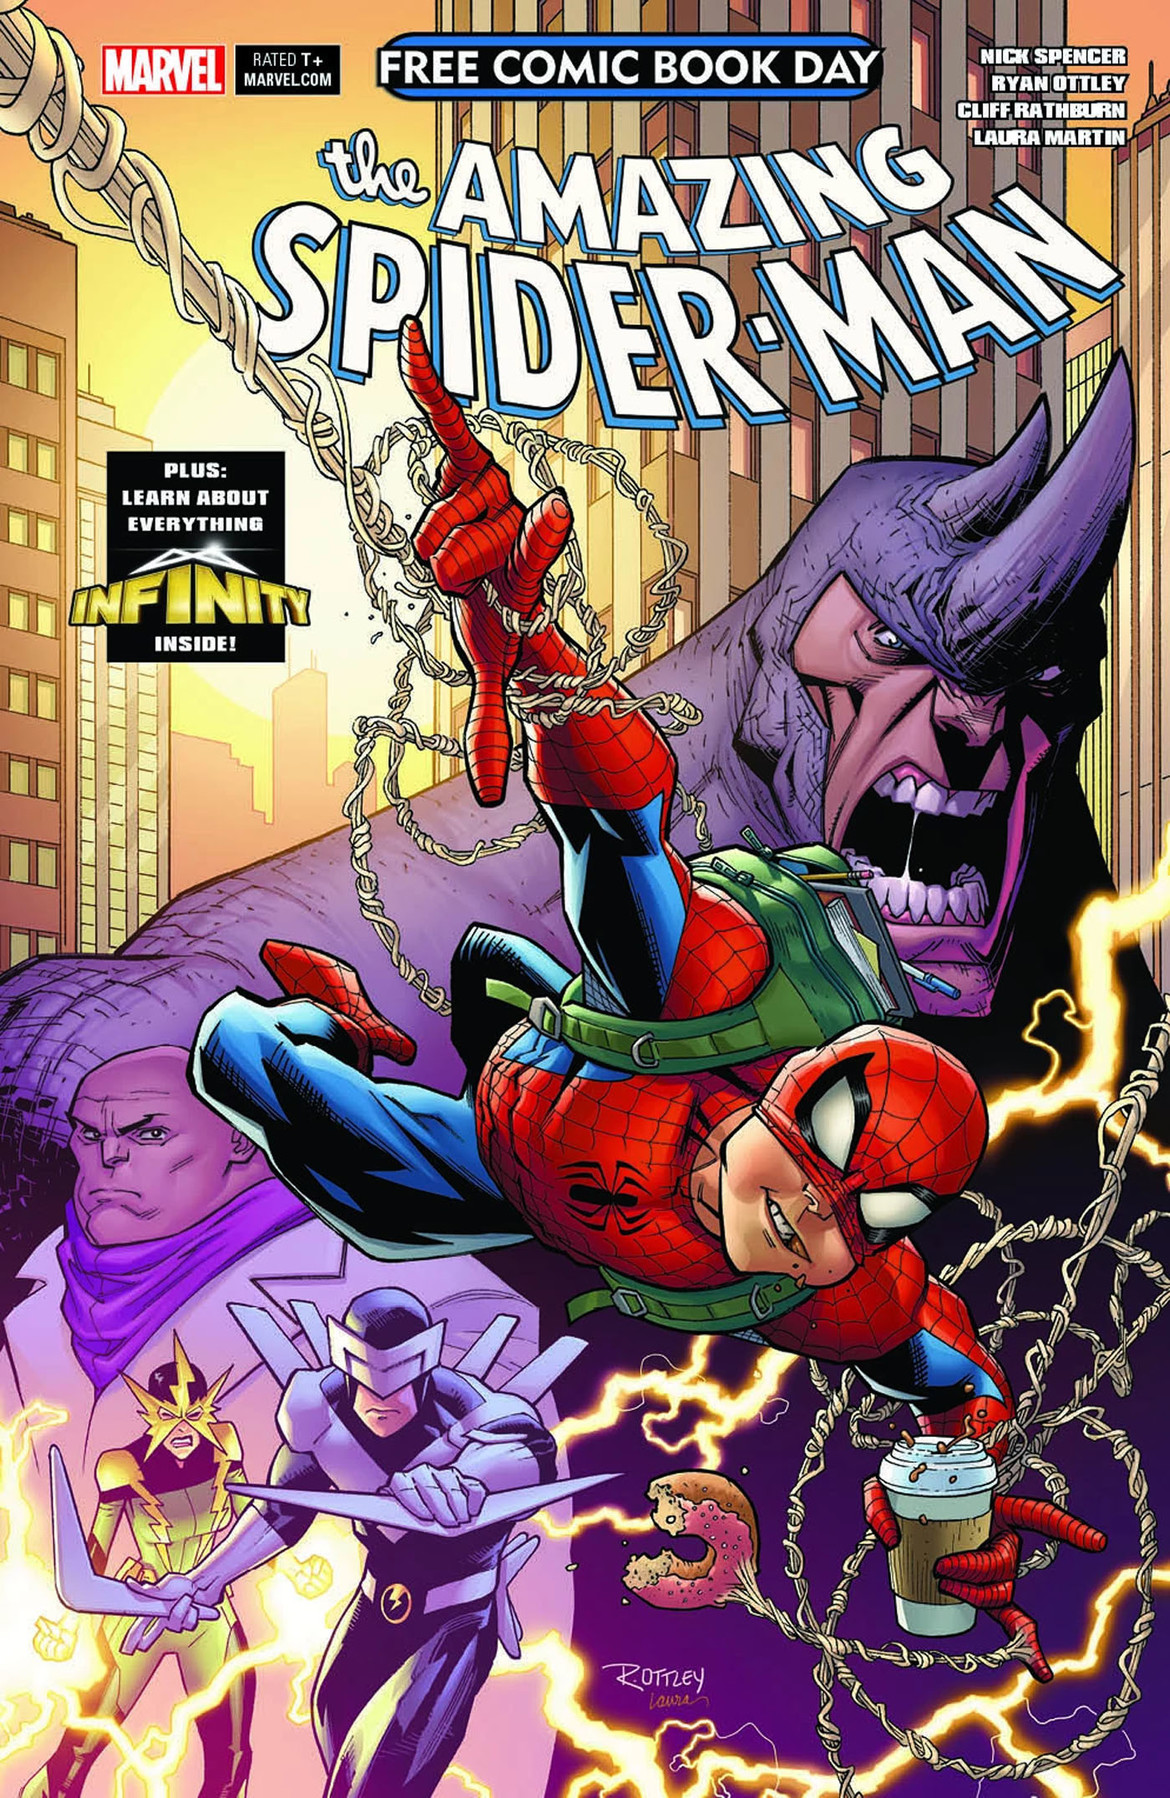 Amazing Spider-Man FCBD 2018